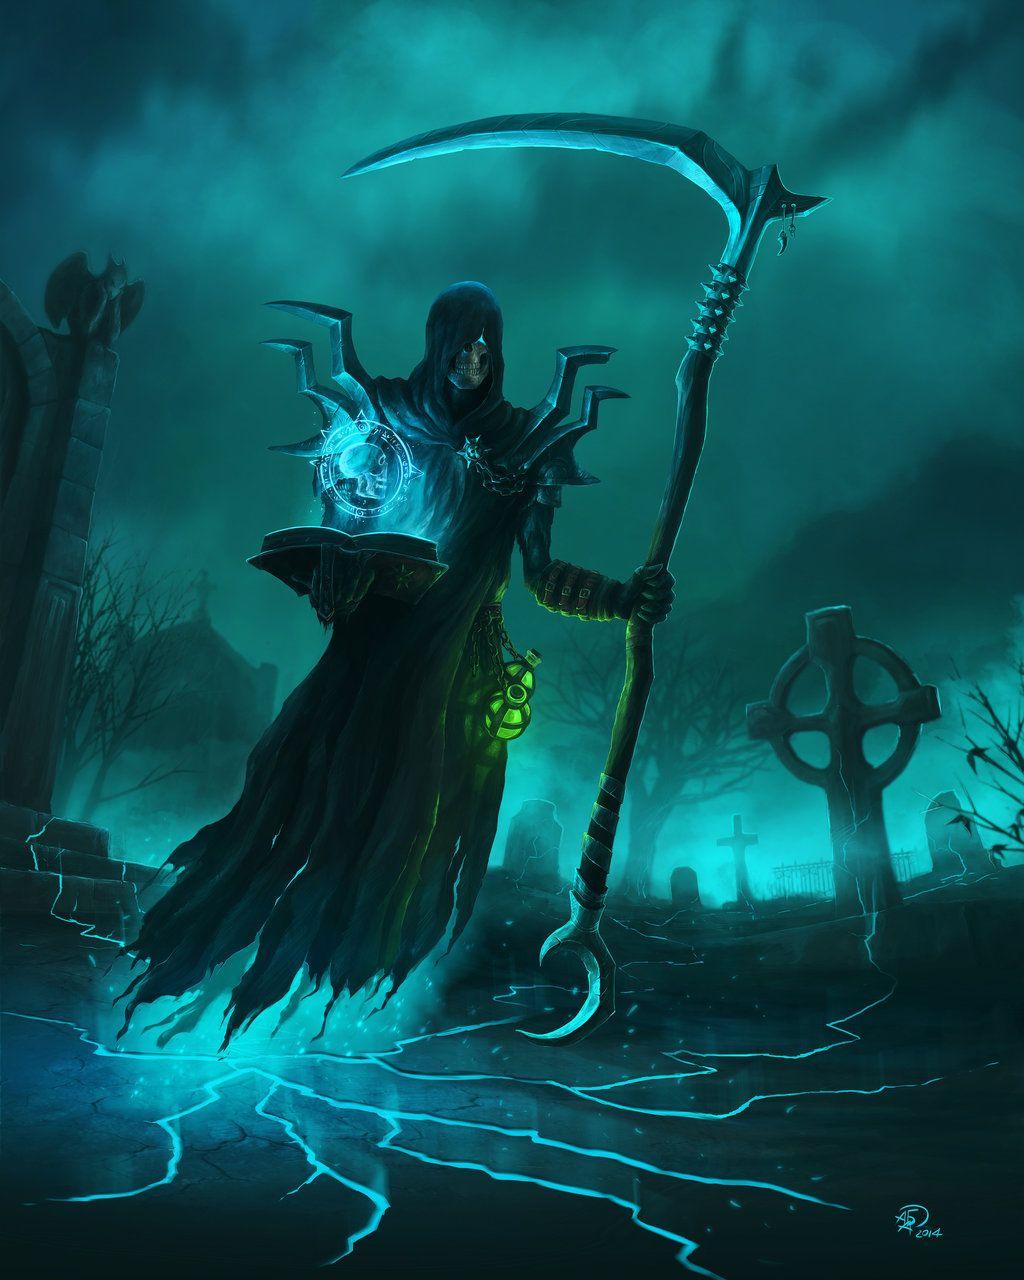 Grim Reaper by Tensor88